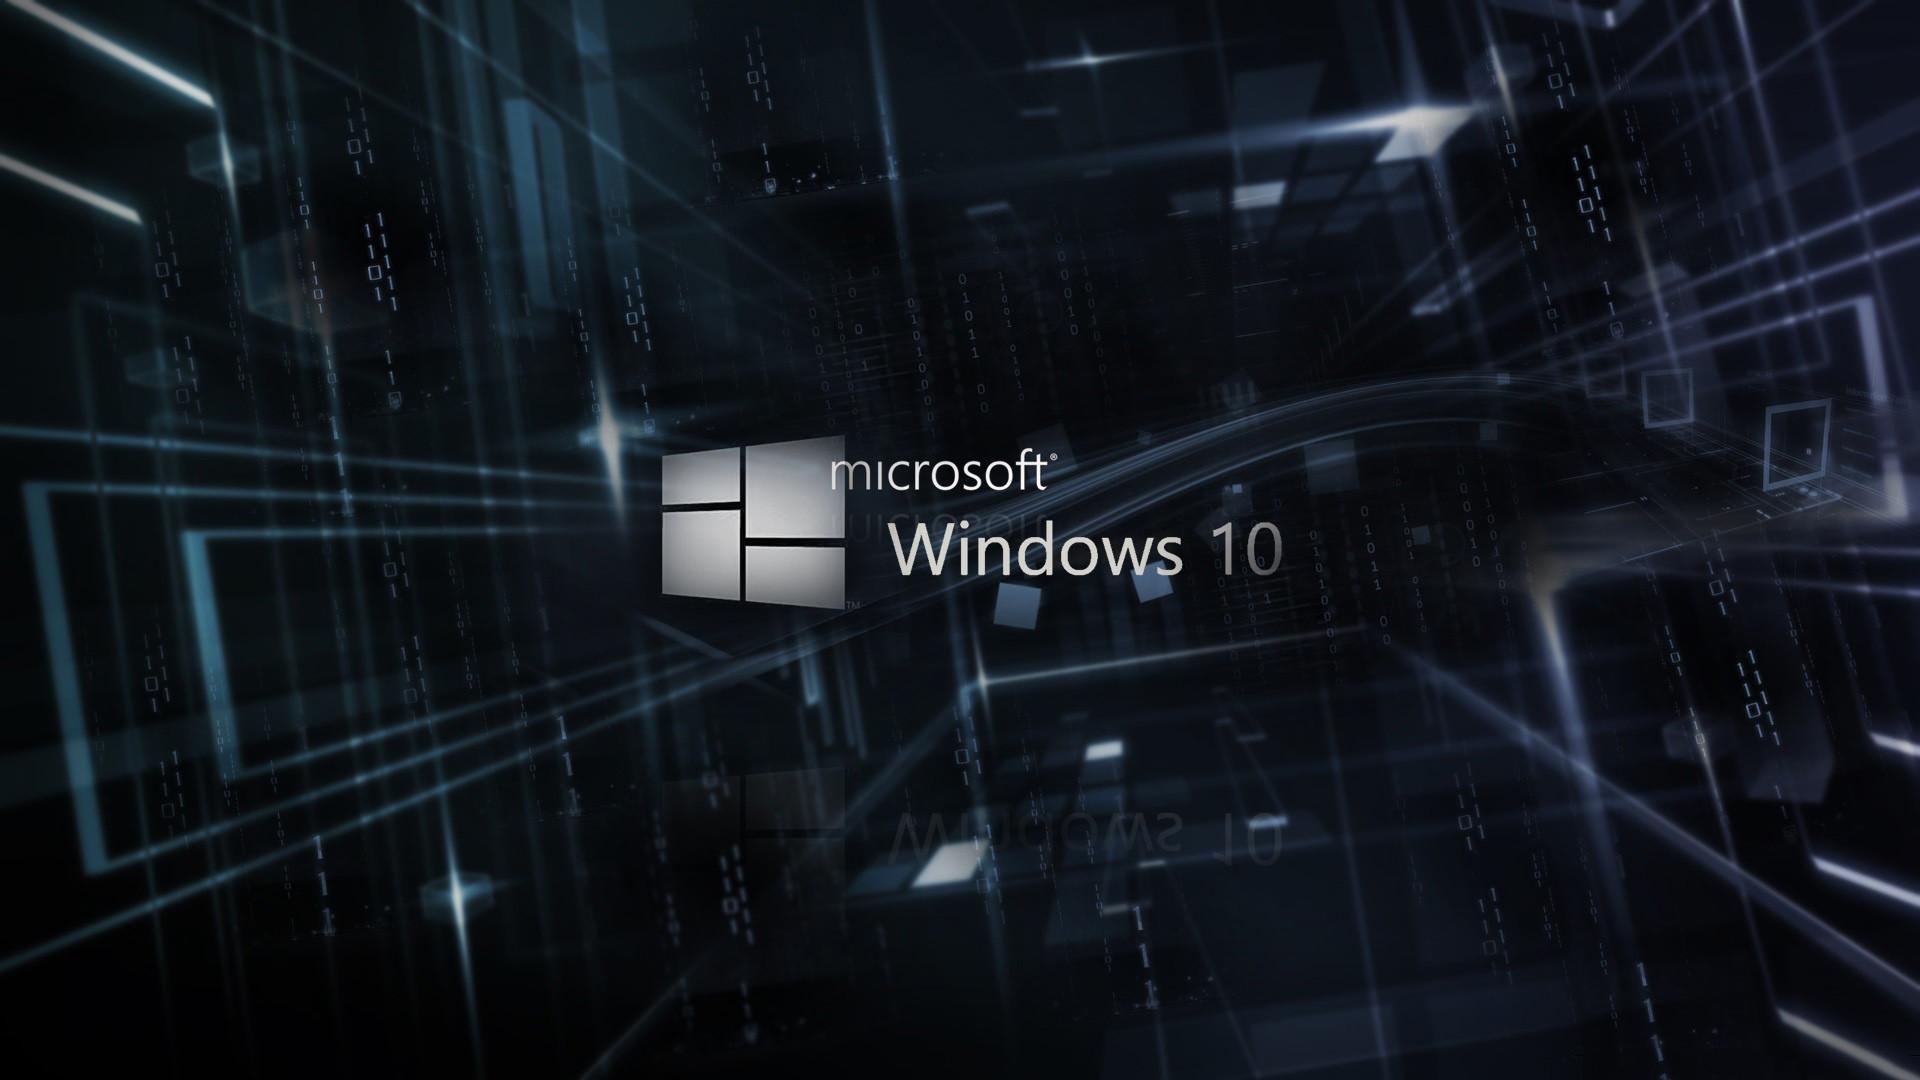 Abstract Animated Screensavers Windows 10